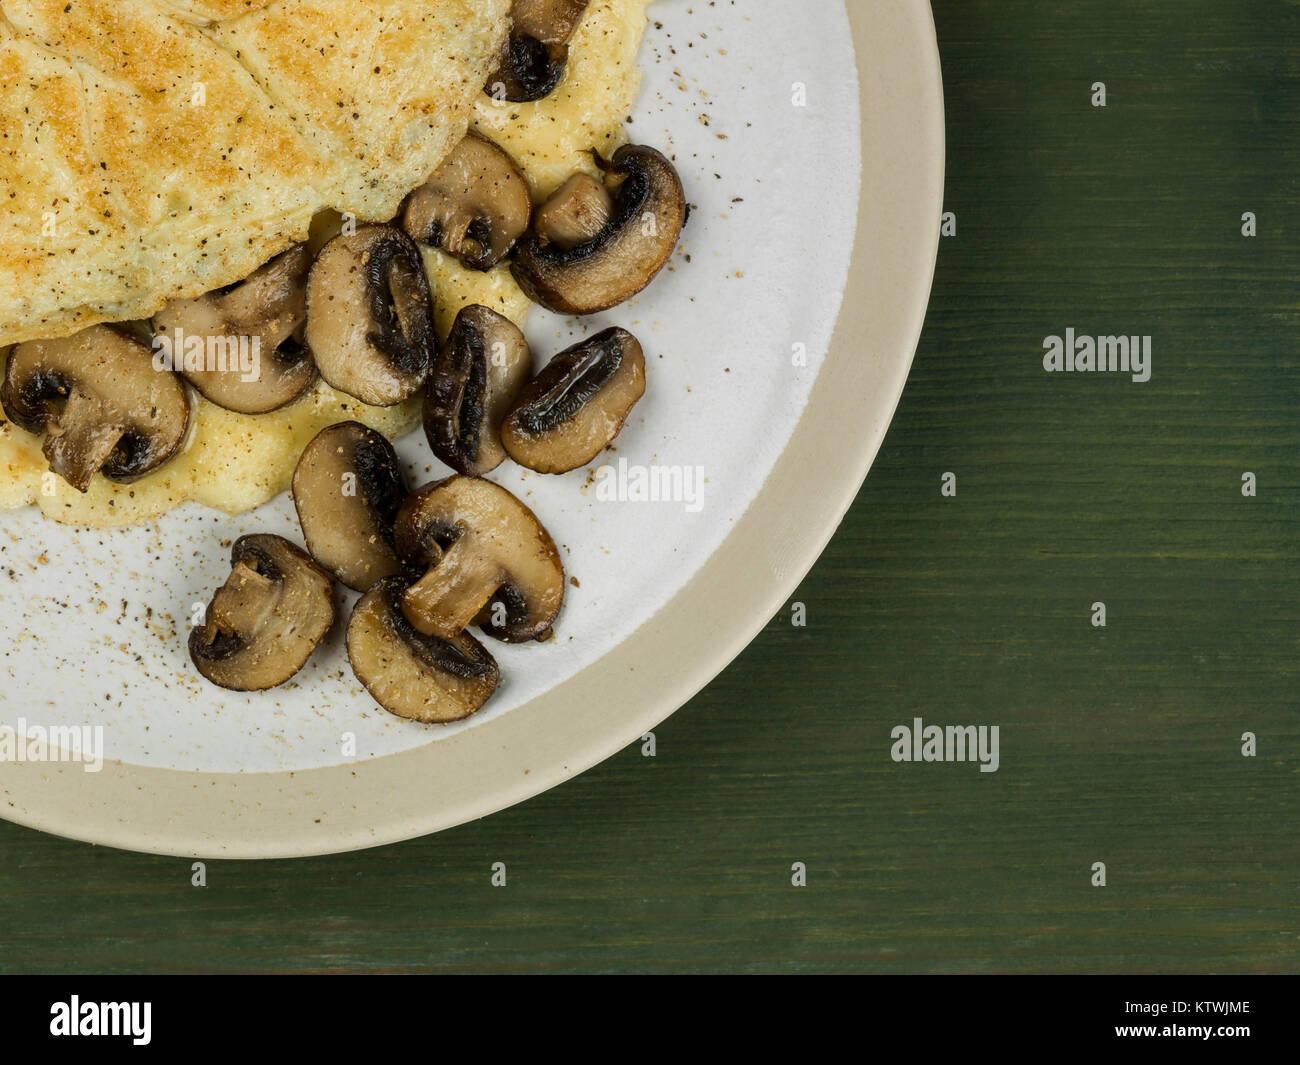 Freshly Cooked Healthy Mushroom Omelette For Breakfast or Lunch - Stock Image